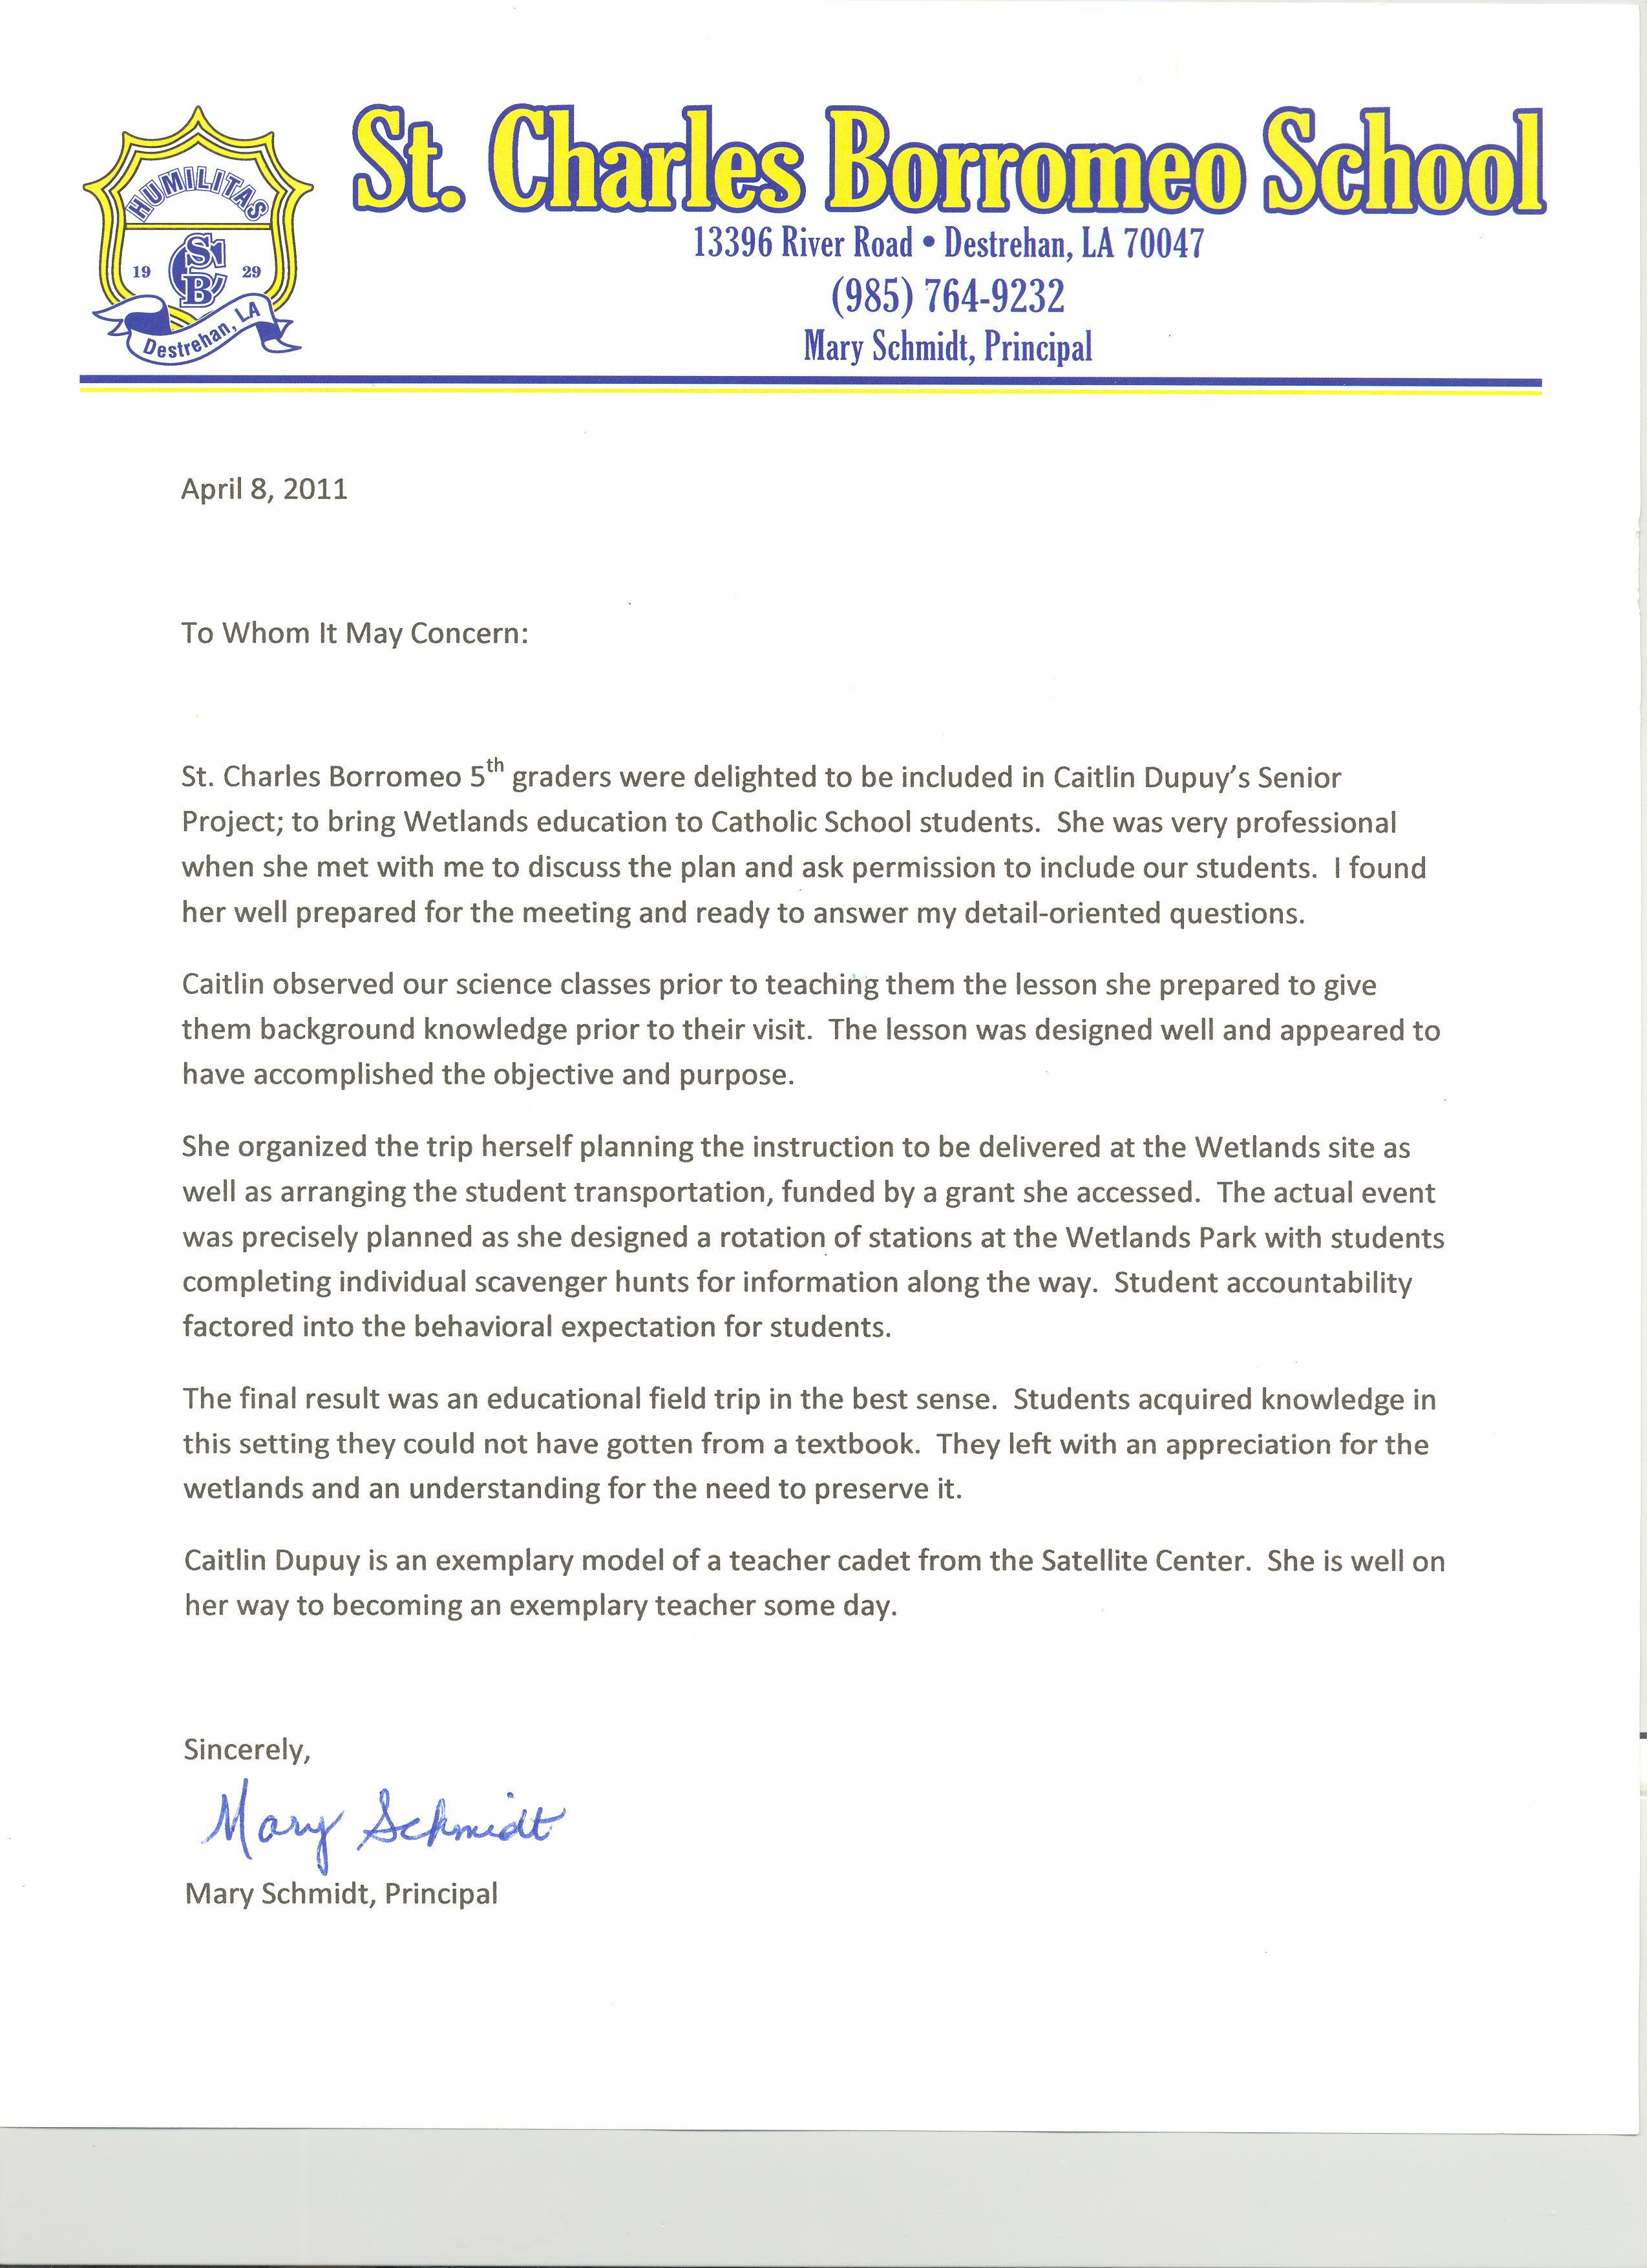 student letter to principal sample customer service resume student letter to principal sample apology letter from student to principal for lettersofrecommendationforteachersfromprincipals